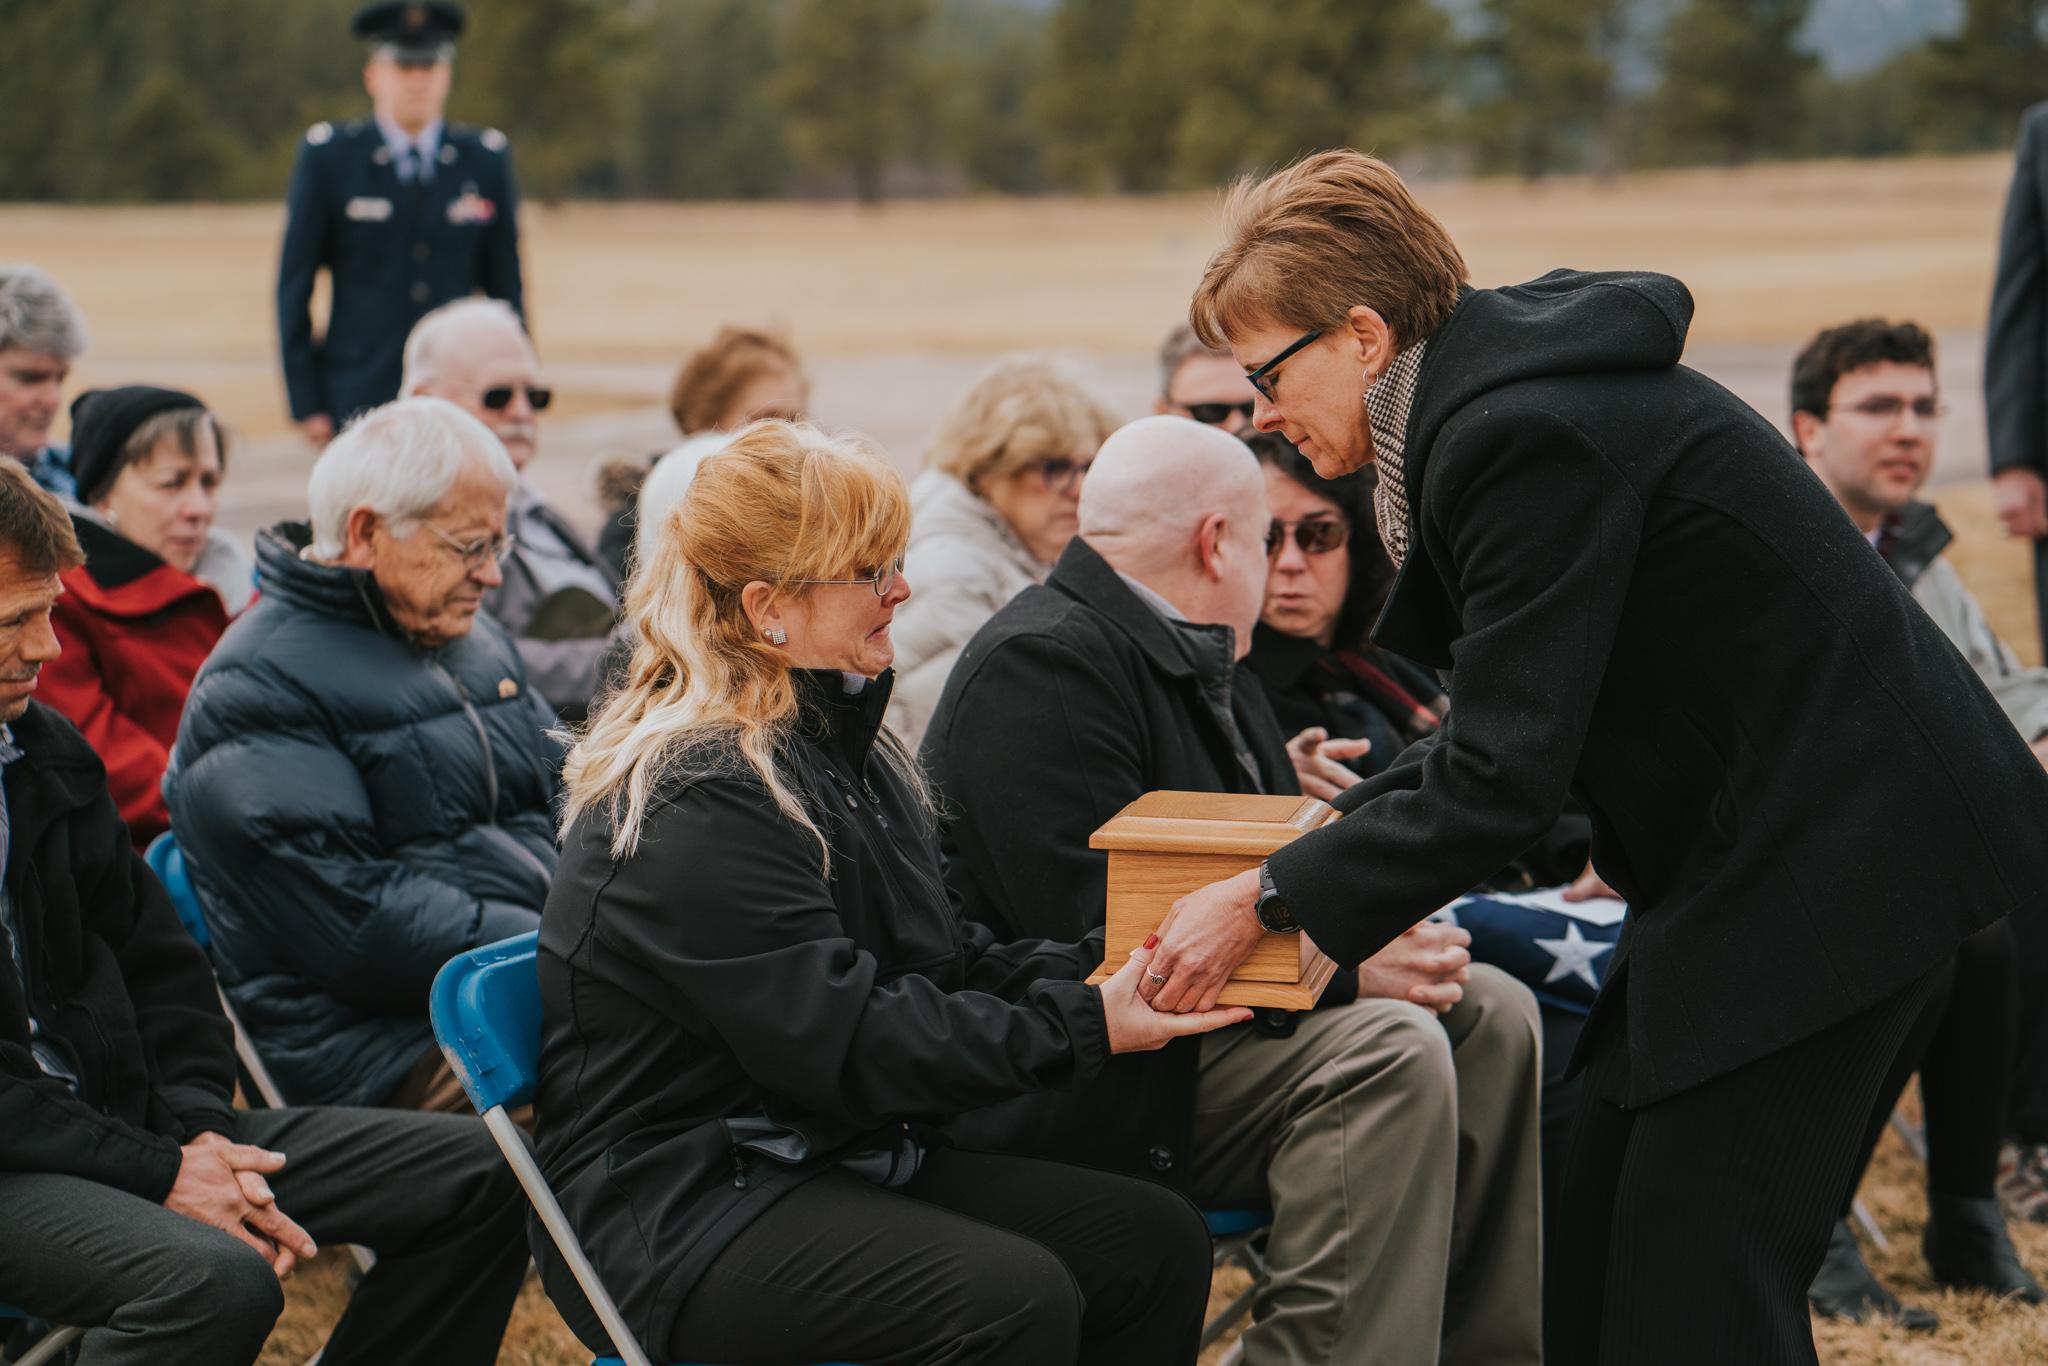 usafa-colorado-military-honours-burial-funeral-photography-grace-elizabeth-colchester-essex-alternative-wedding-lifestyle-photographer (91 of 127).jpg